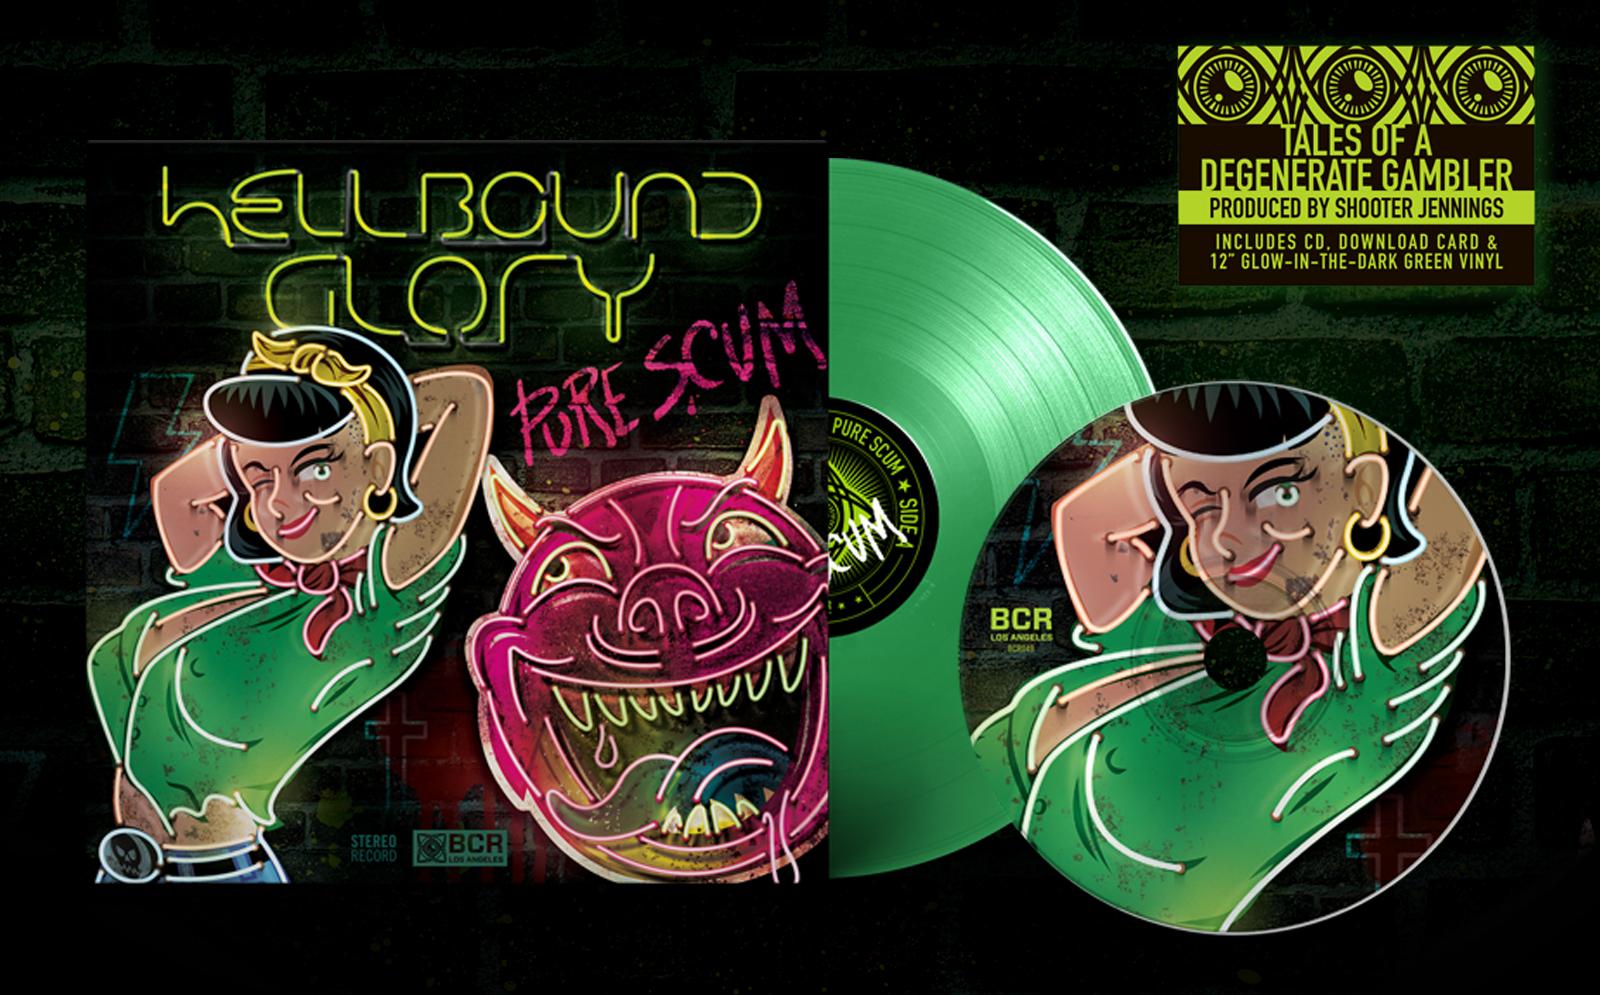 Hellbound Glory - Pure Scum Pre Order